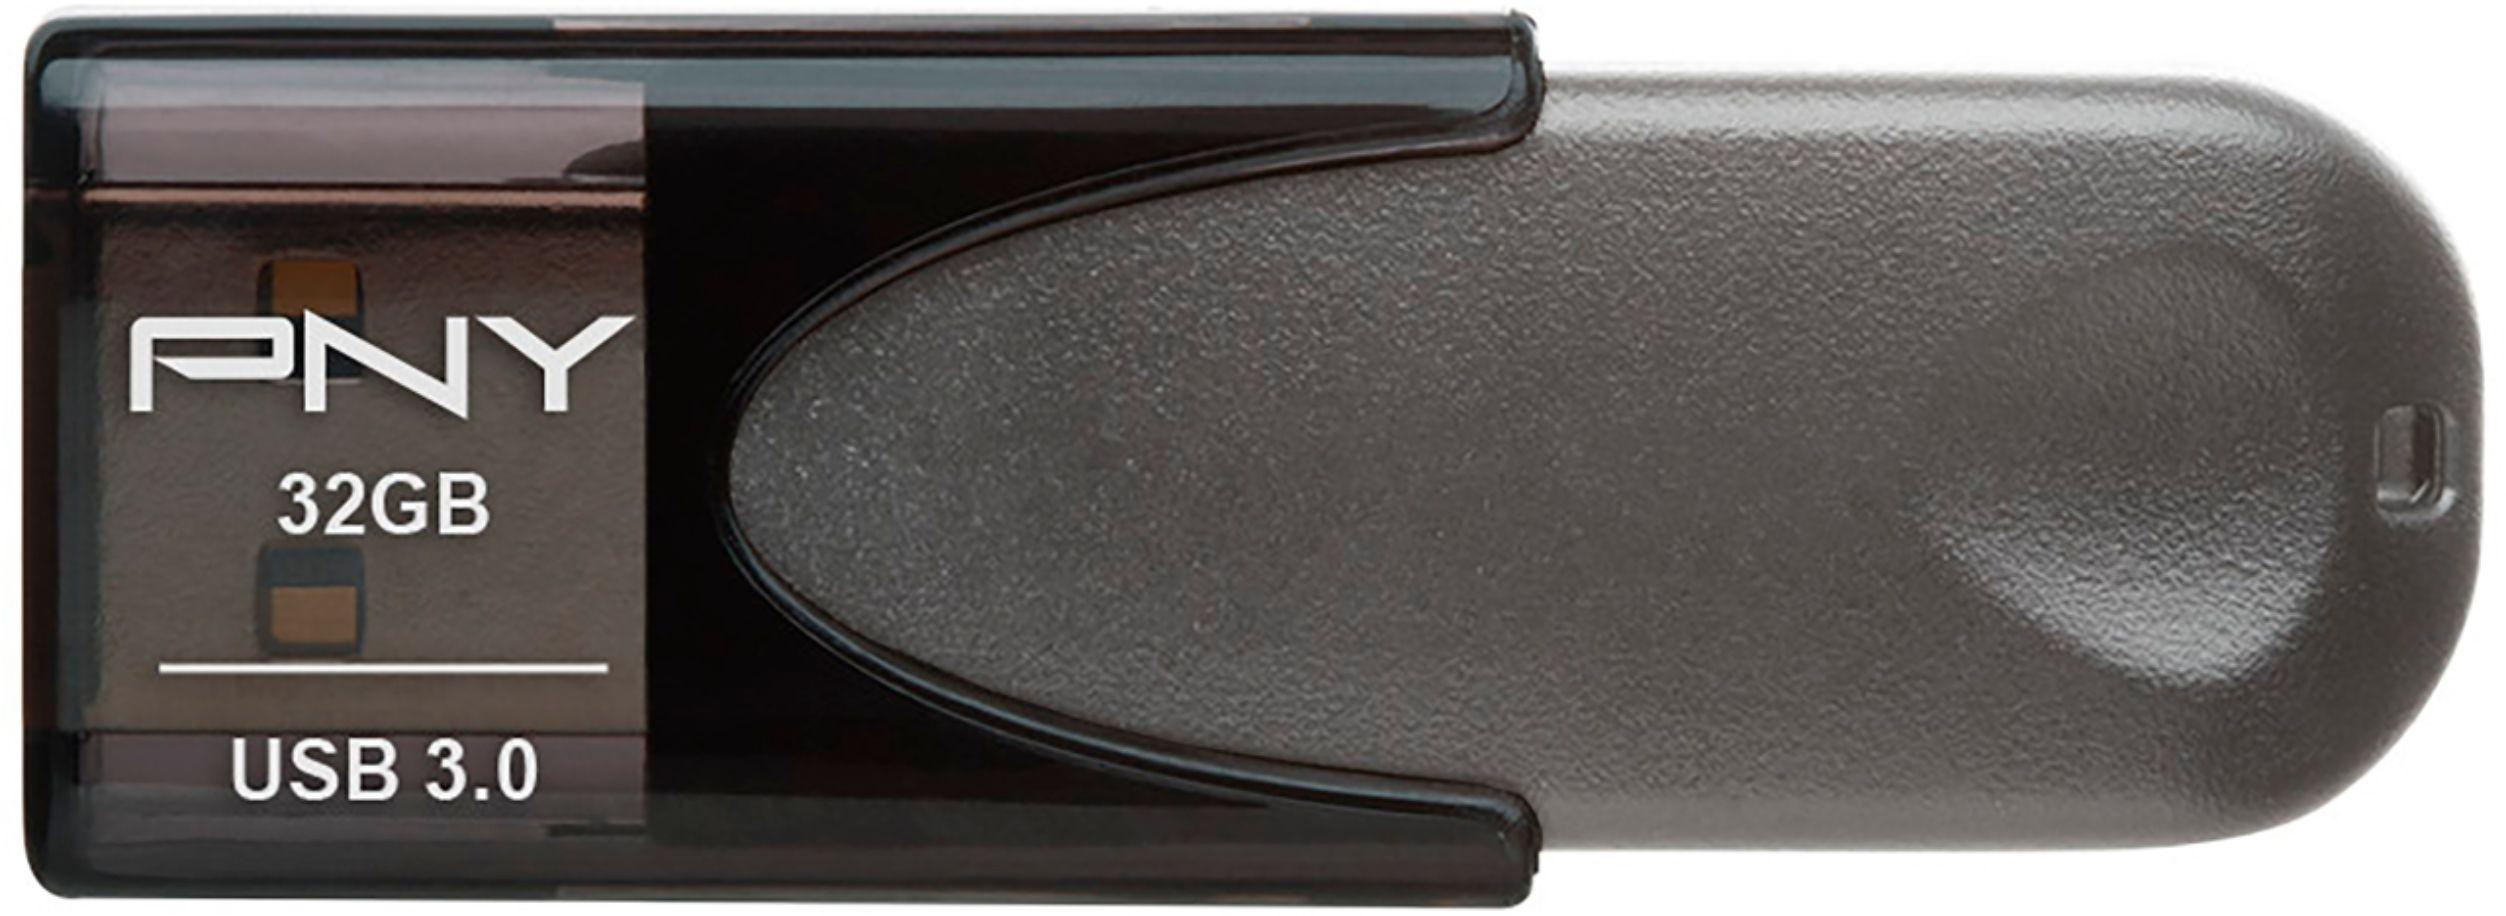 PNY 32GB Turbo USB 3.0 Flash Drive For USB Devices - Black